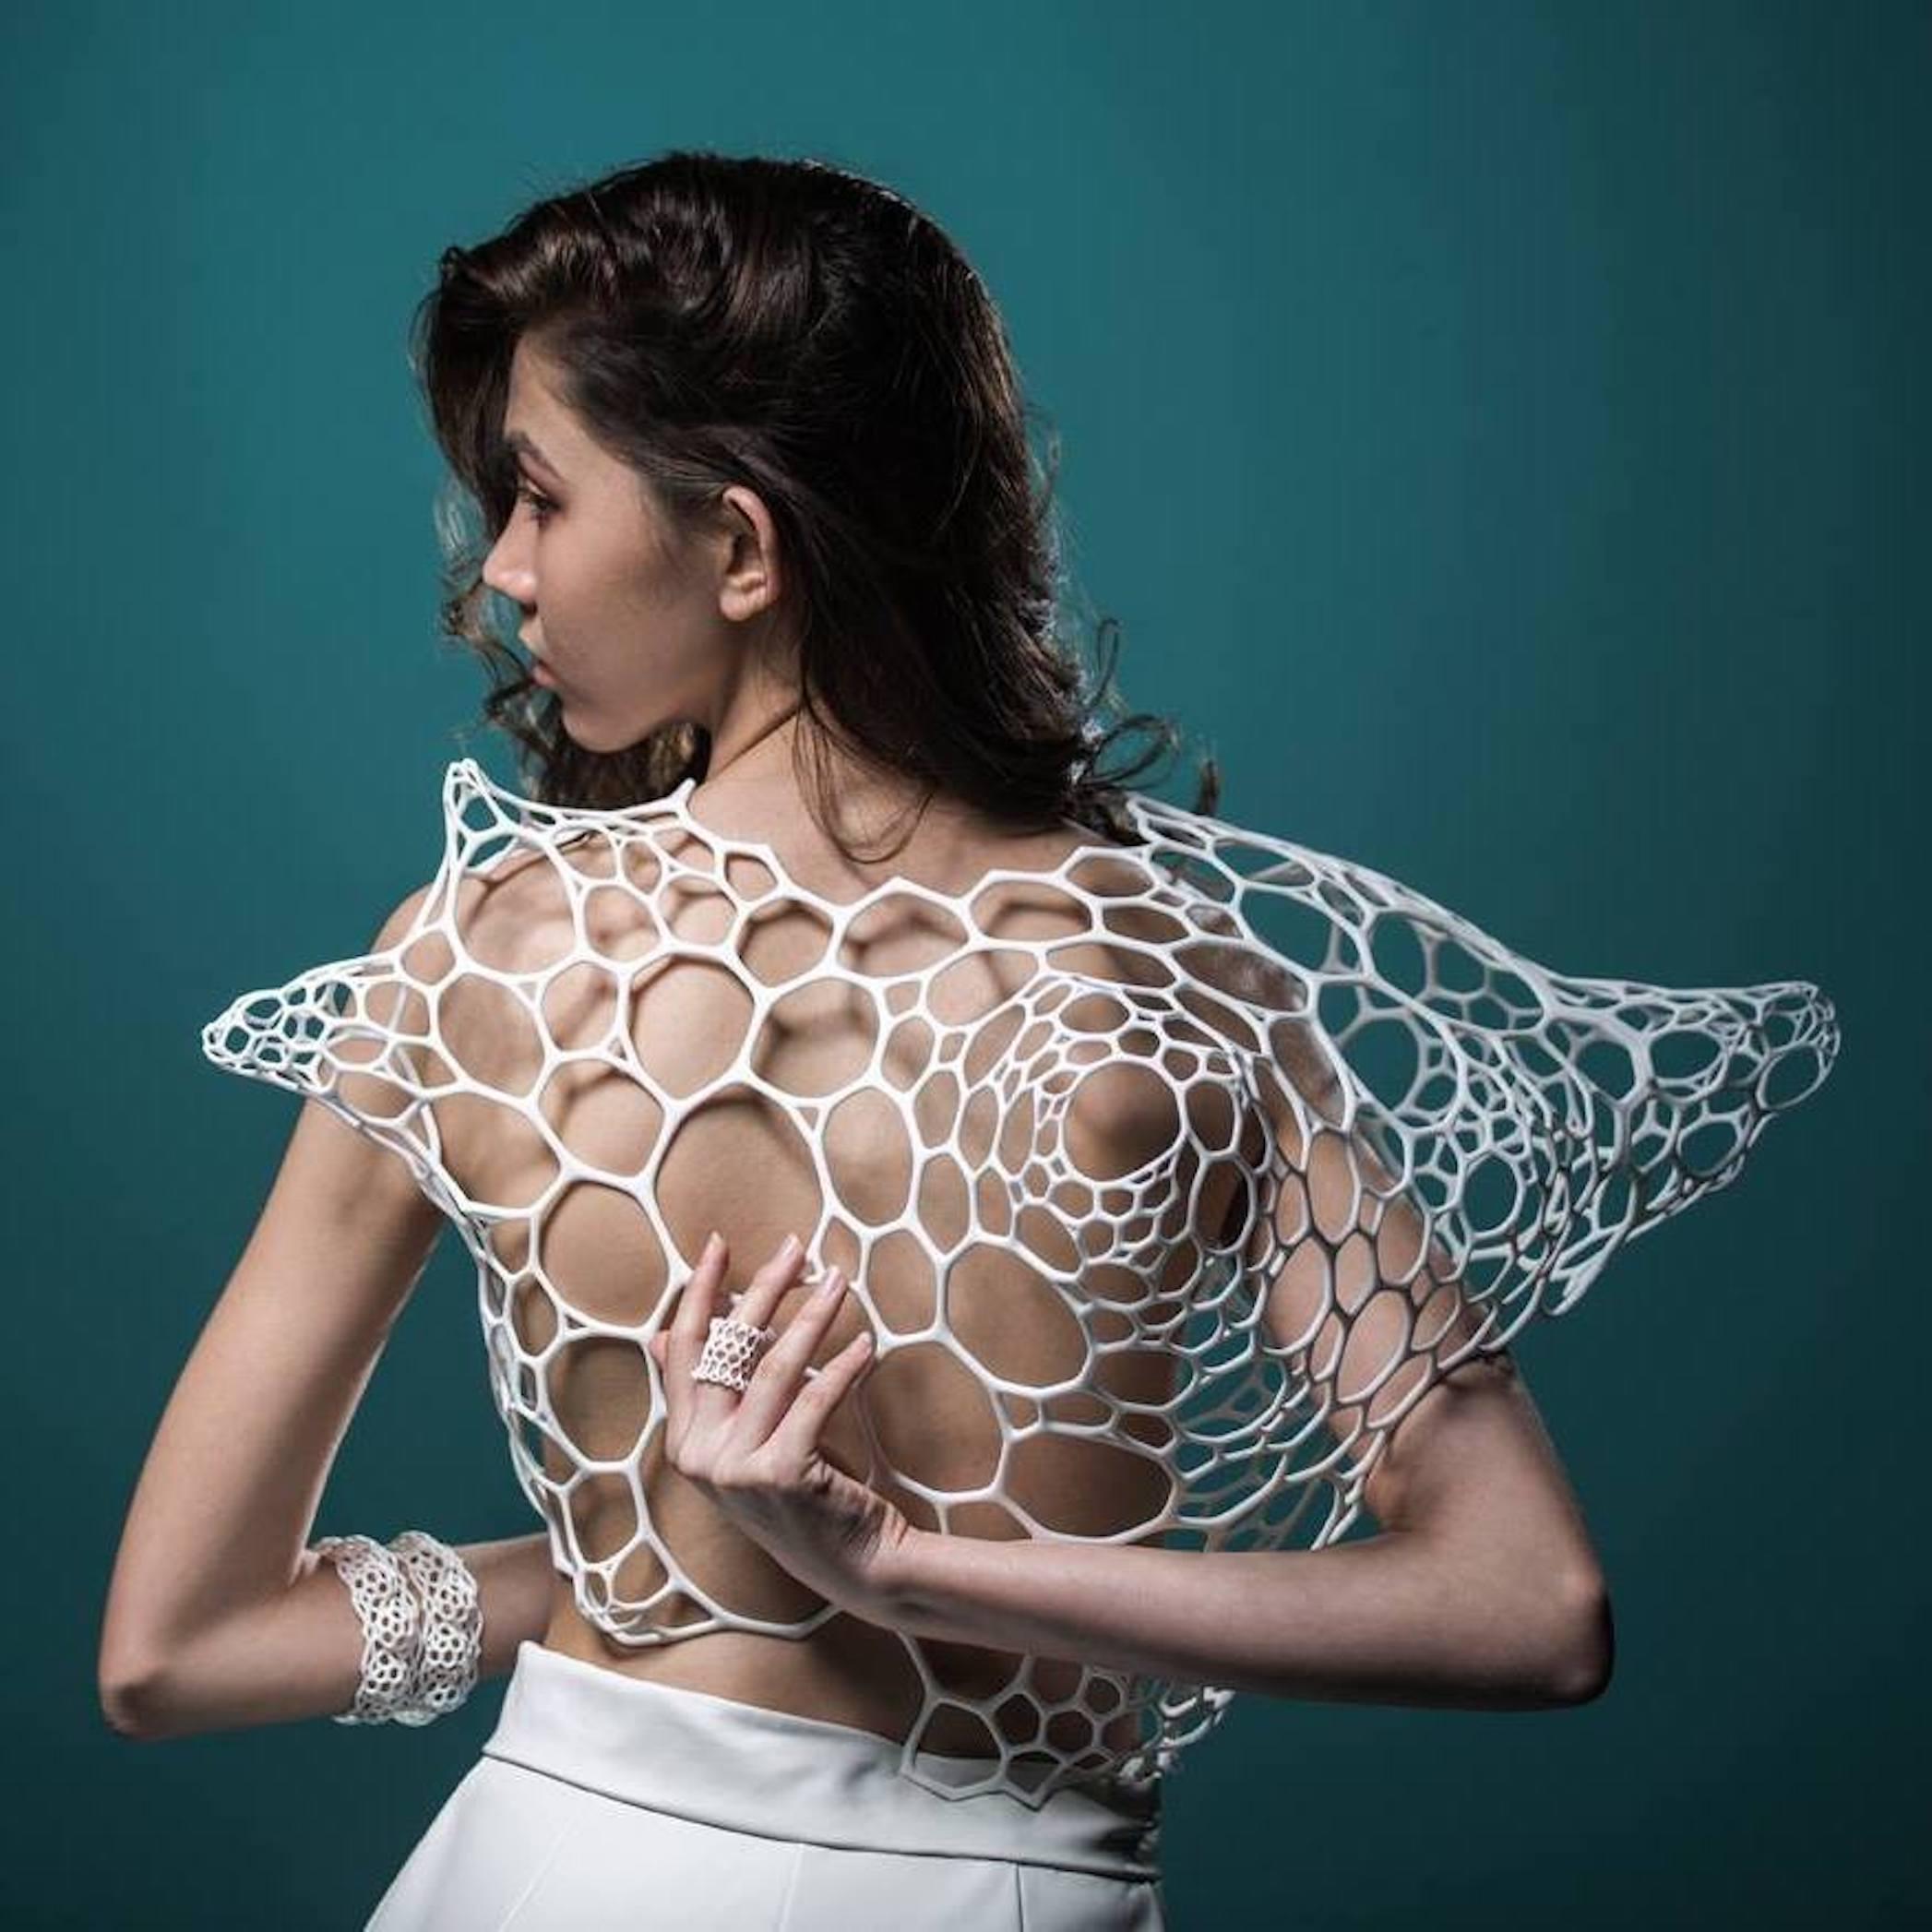 Singapore fashion labels: Baelf